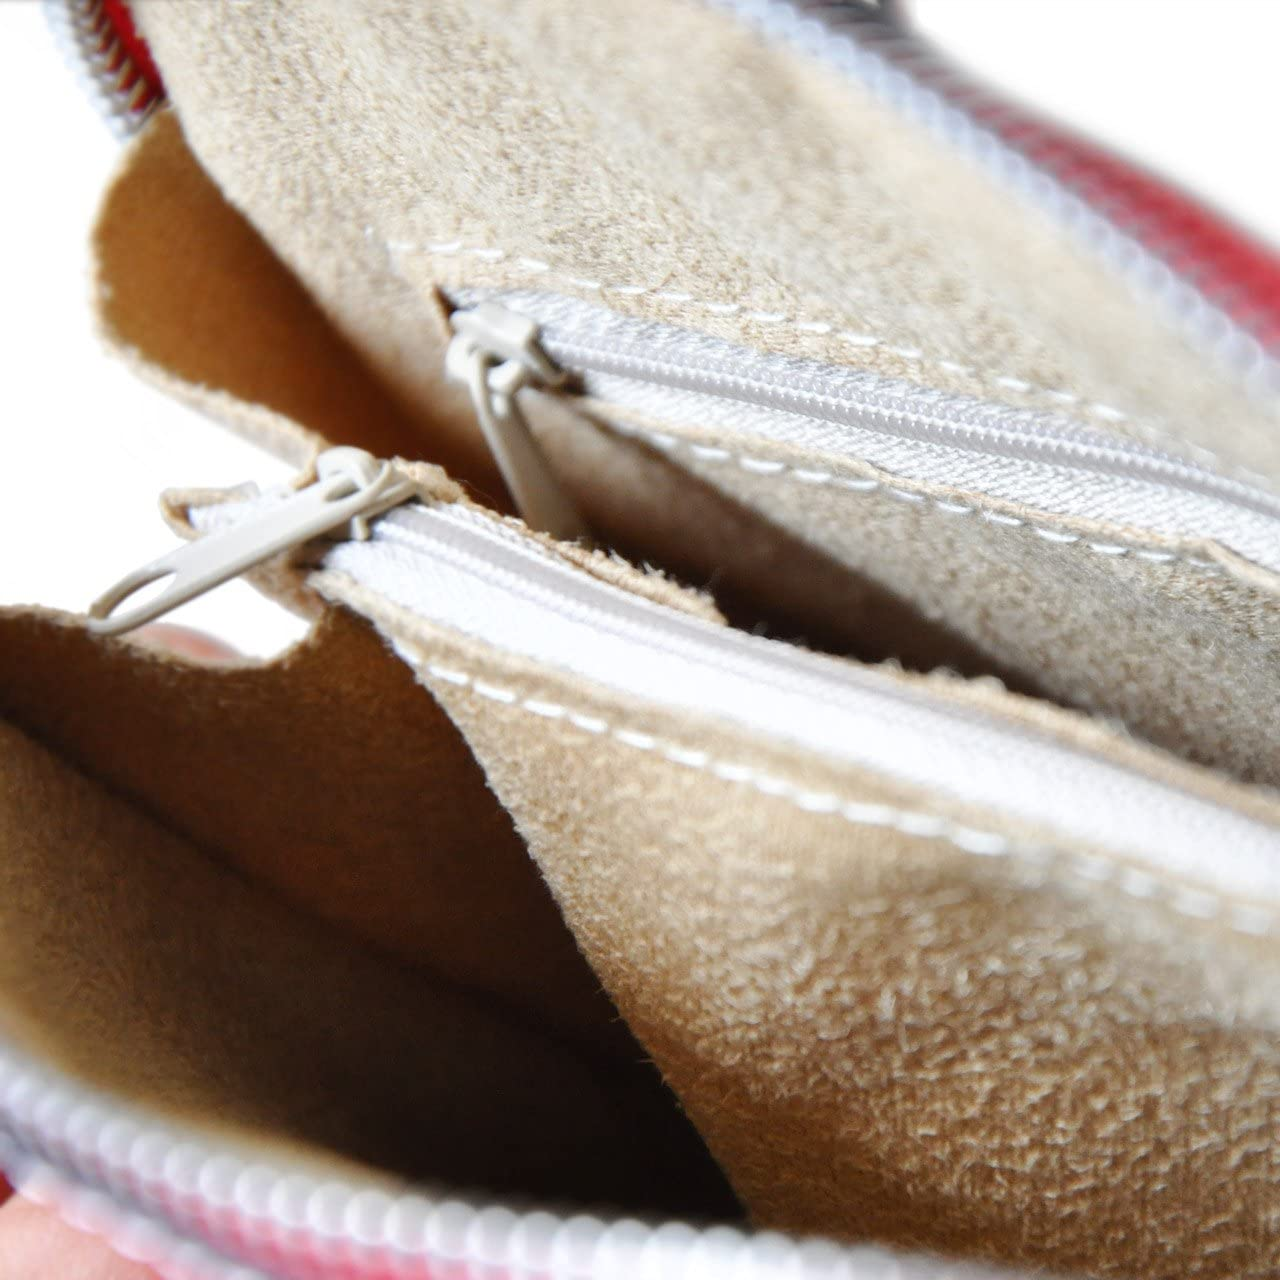 Pratesi Womens Italian Leather Volterra Small Crossbody Clutchbag in Cow Leather